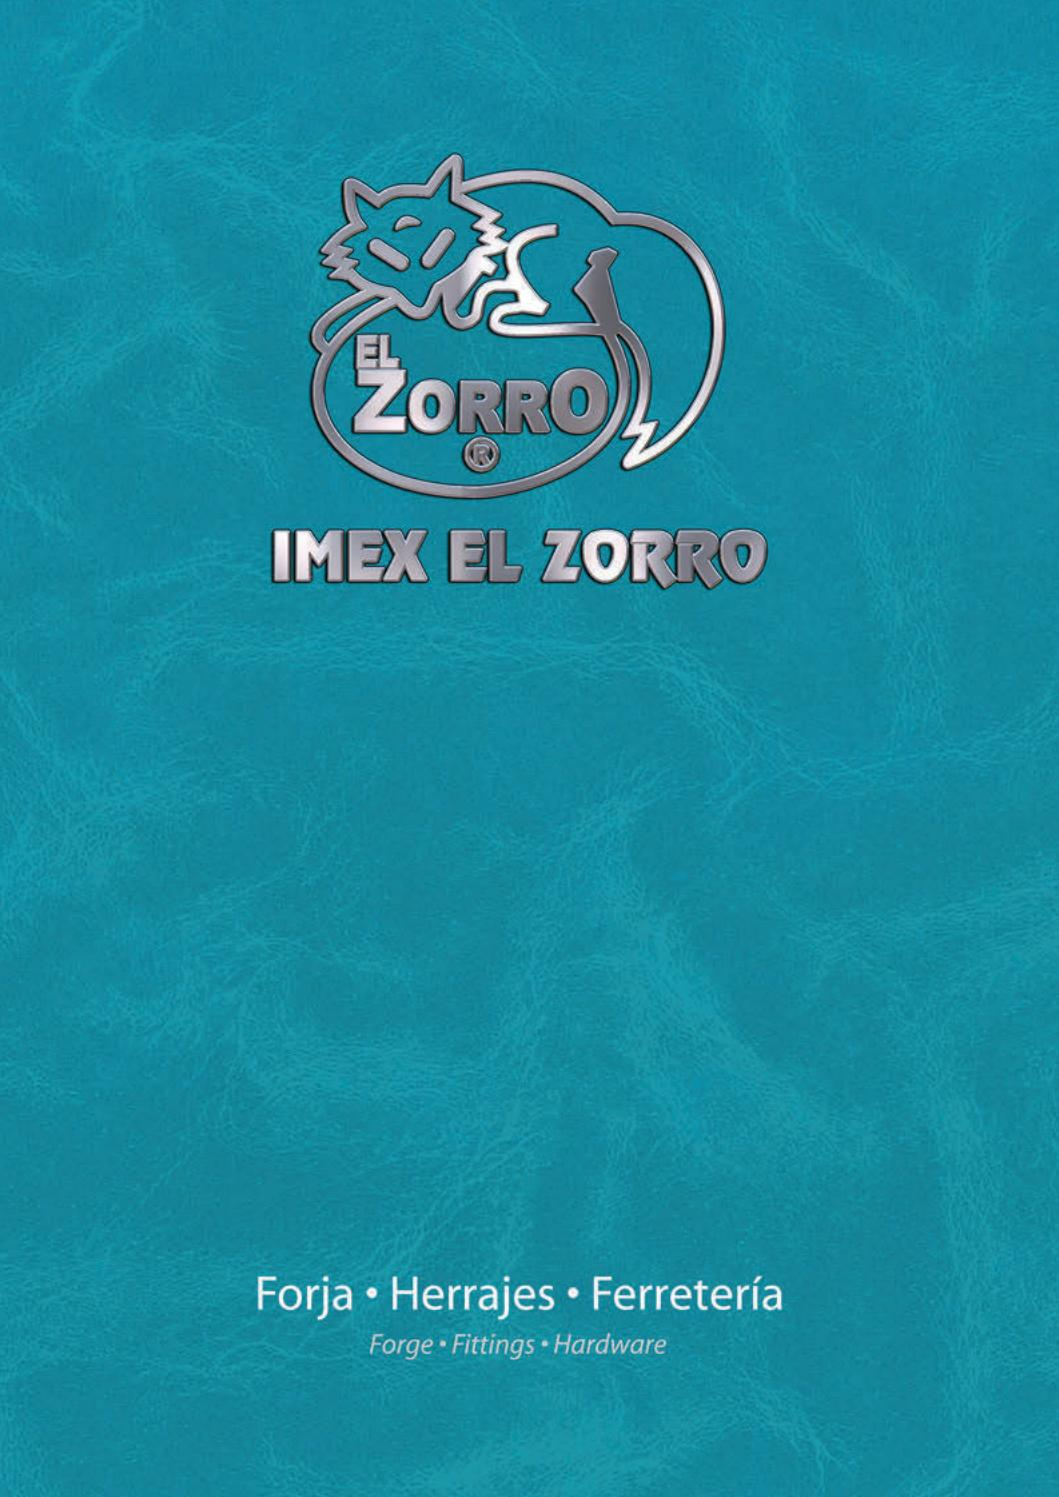 250 mm Imex El Zorro 73922-B El Zorro 73922-B-Pasador